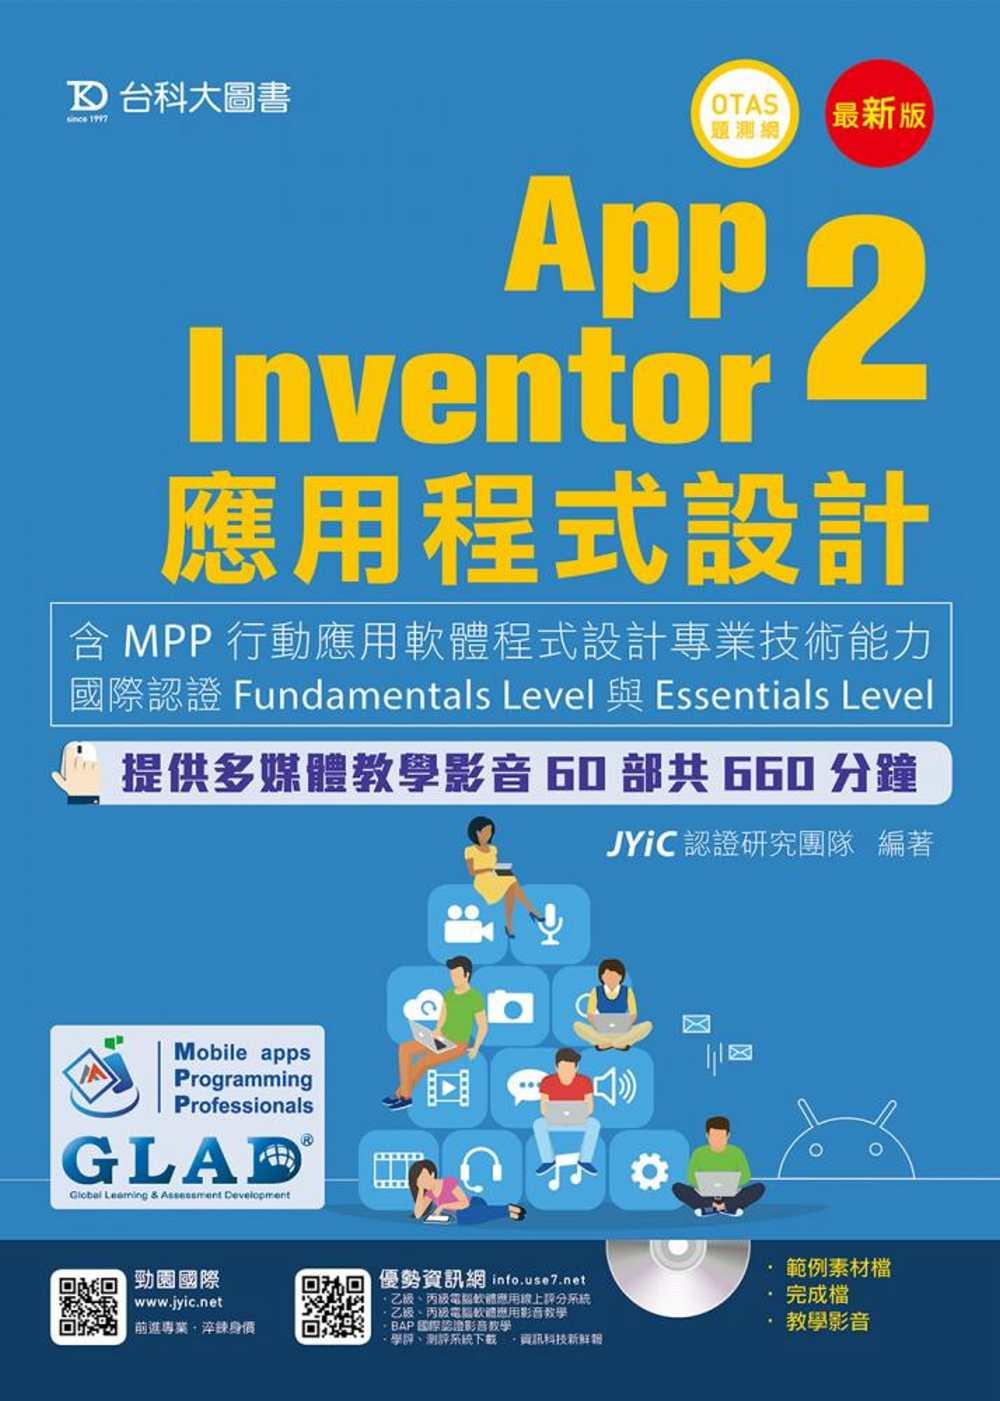 App Inventor 2應用程式設計:含MPP行動應用軟體程式設計專業技術能力國際認證Fundamentals Level與Essentials Level 附多媒體影音教學光碟(附贈OTAS題測系統)